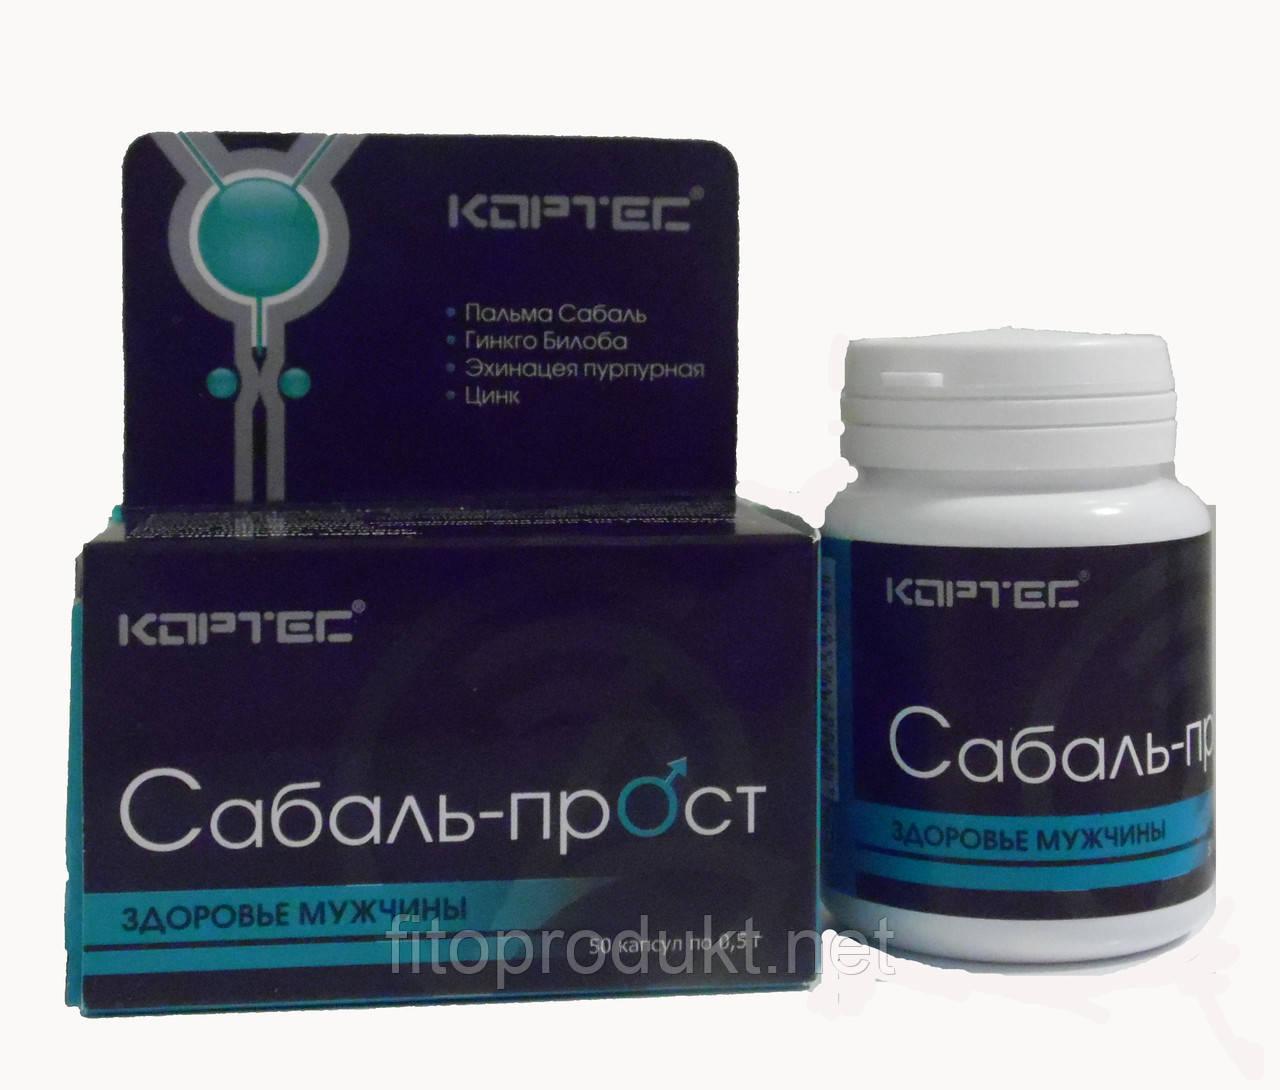 Сабаль-прост здоровье мужчины 50 капсул Кортес